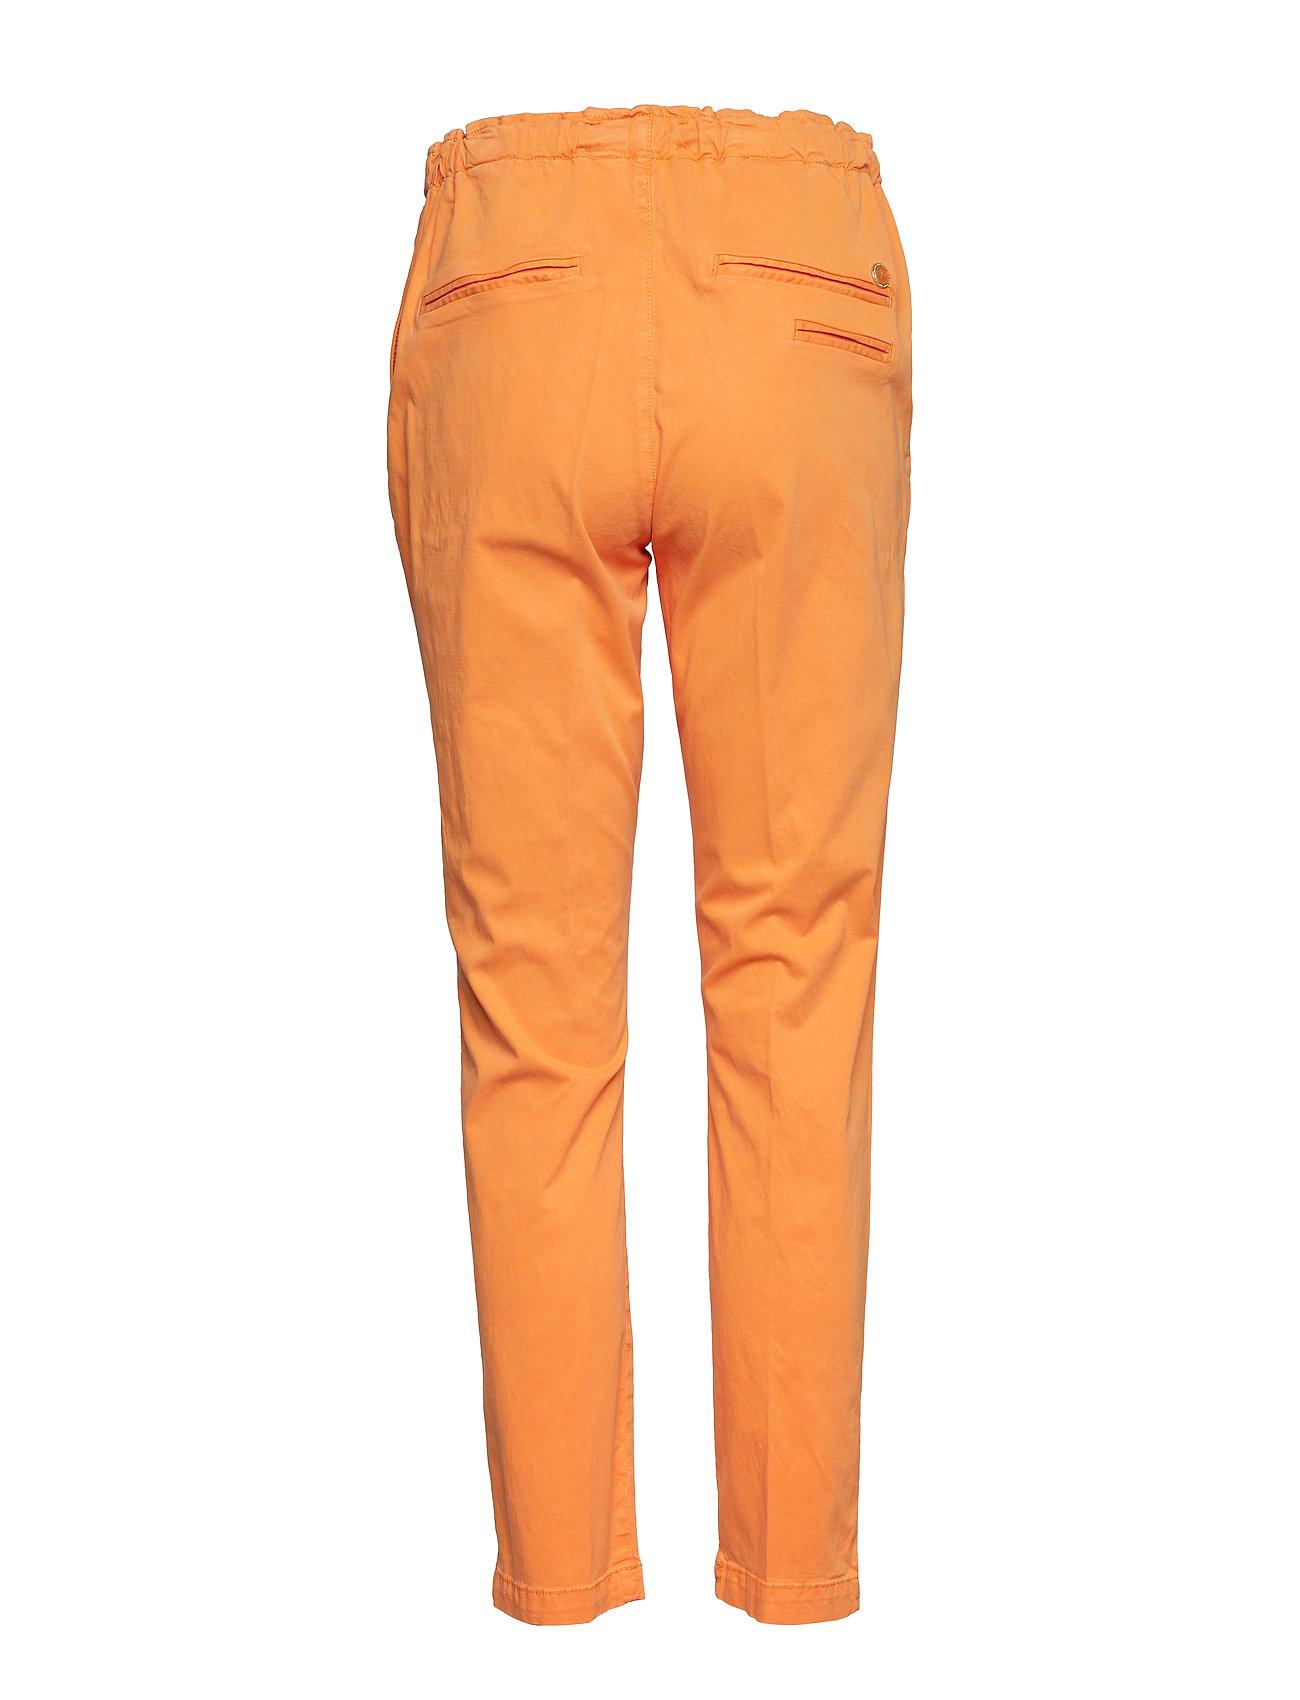 MOS MOSH Patton Nature Pant - Trousers SUN ORANGE